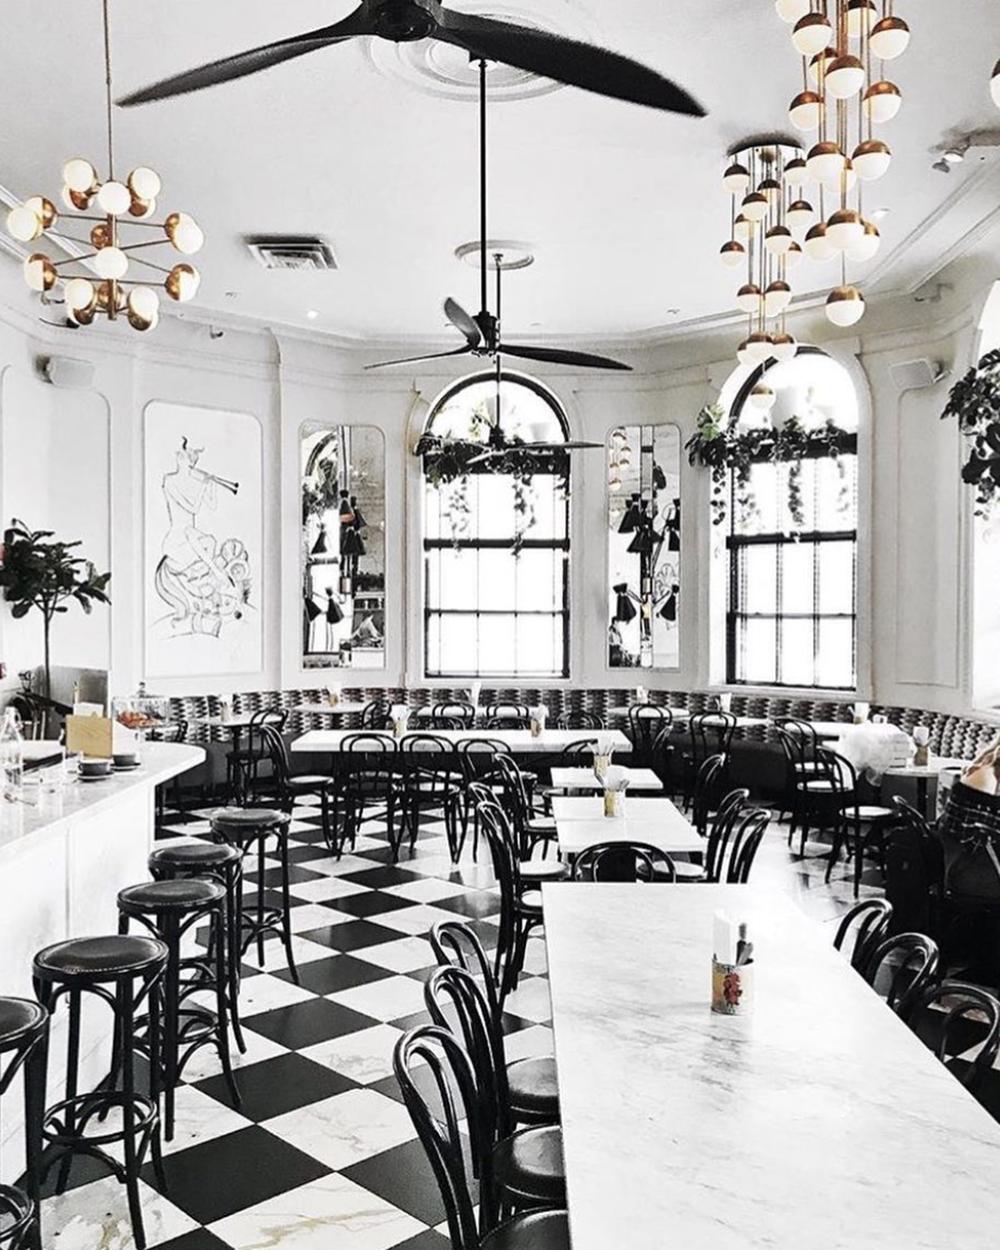 locali instagrammabili new york ristorante